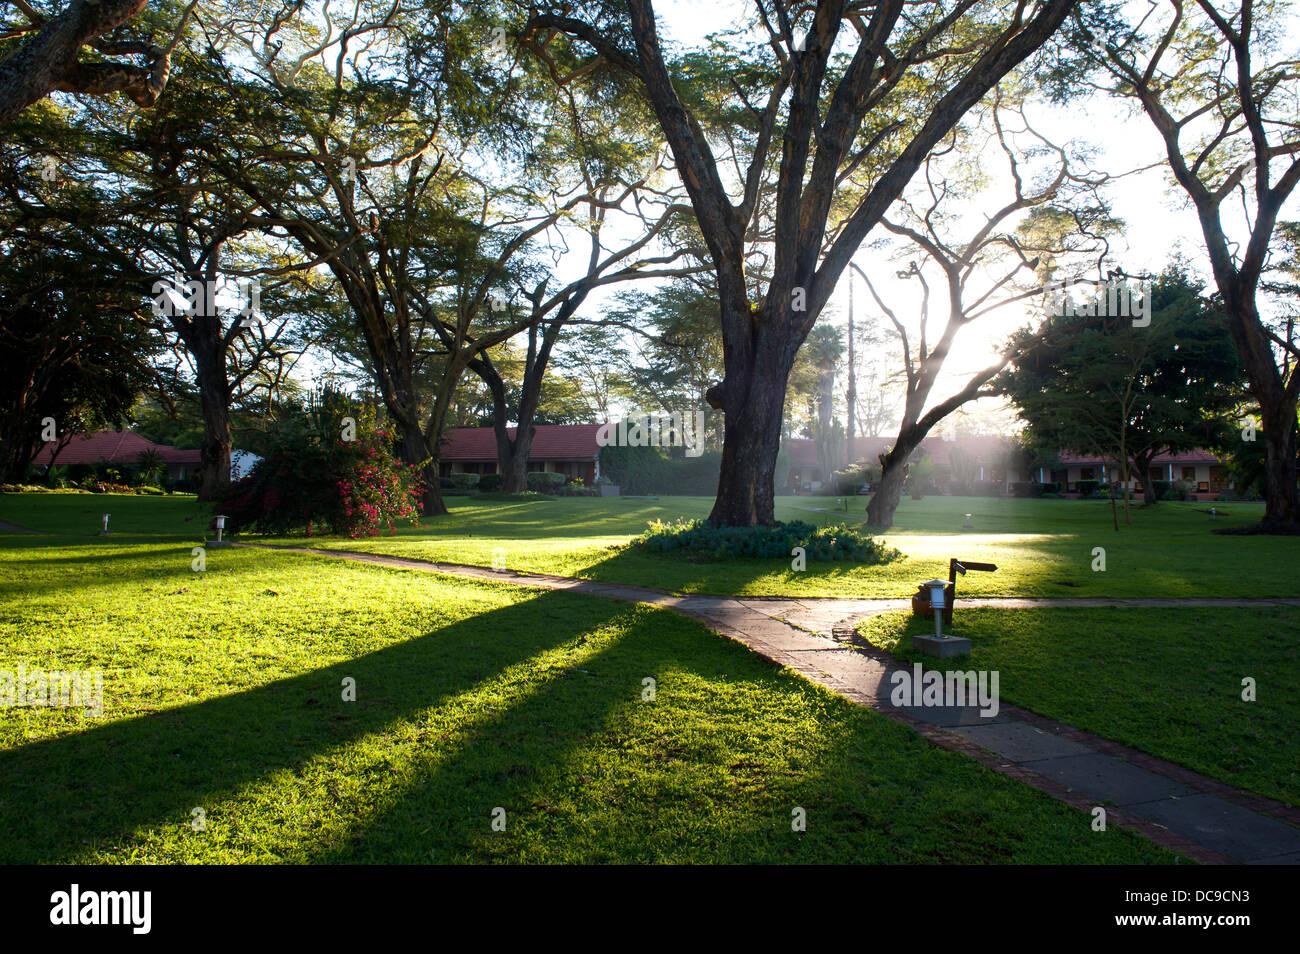 Hermoso parque con luz solar a través de un árbol de transmisión Foto de stock